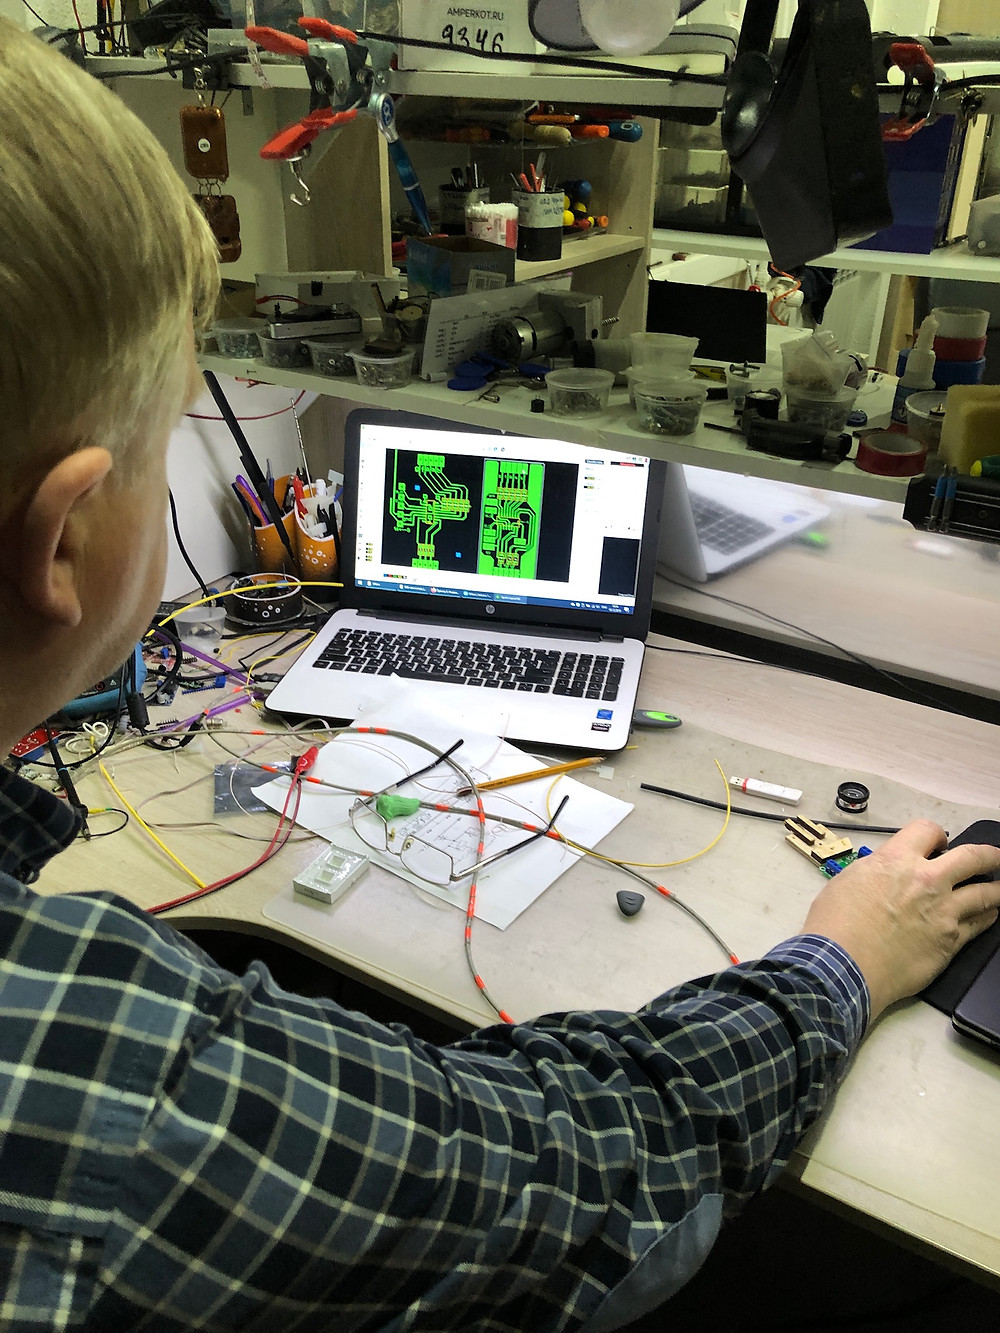 Design process of circuit board